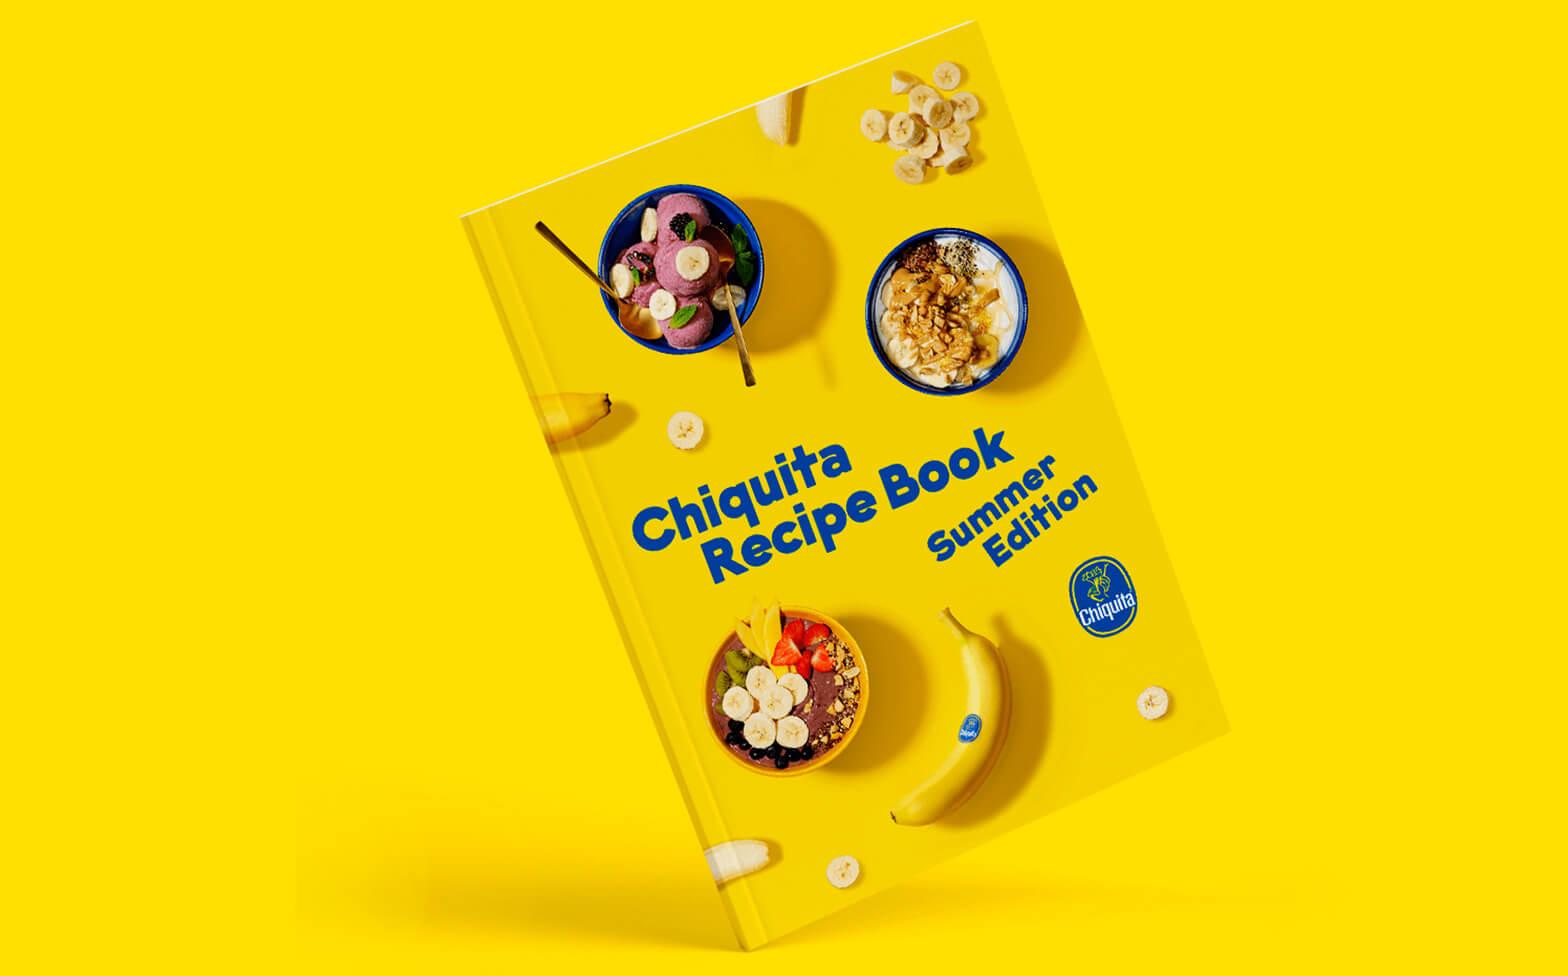 Chiquita summer campaign ebook smoothie EN